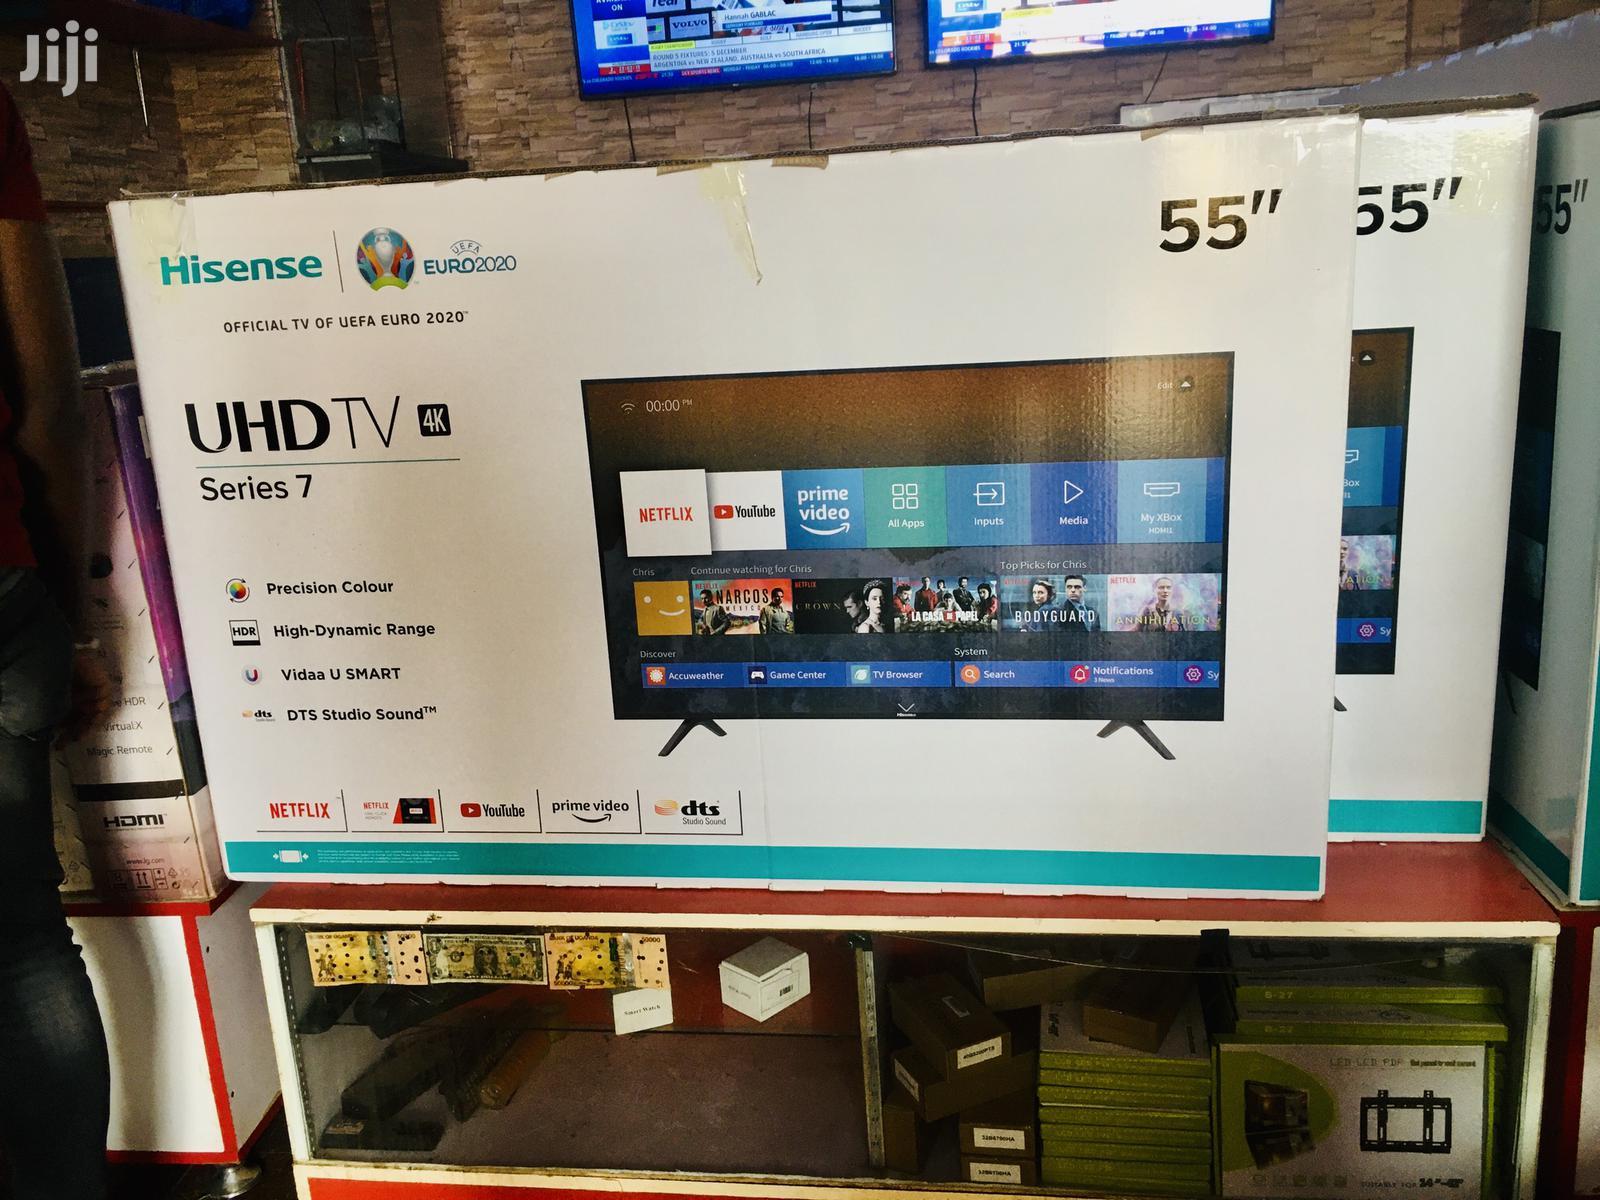 Hisense 55 Inches New UHD 4K Smart TV B